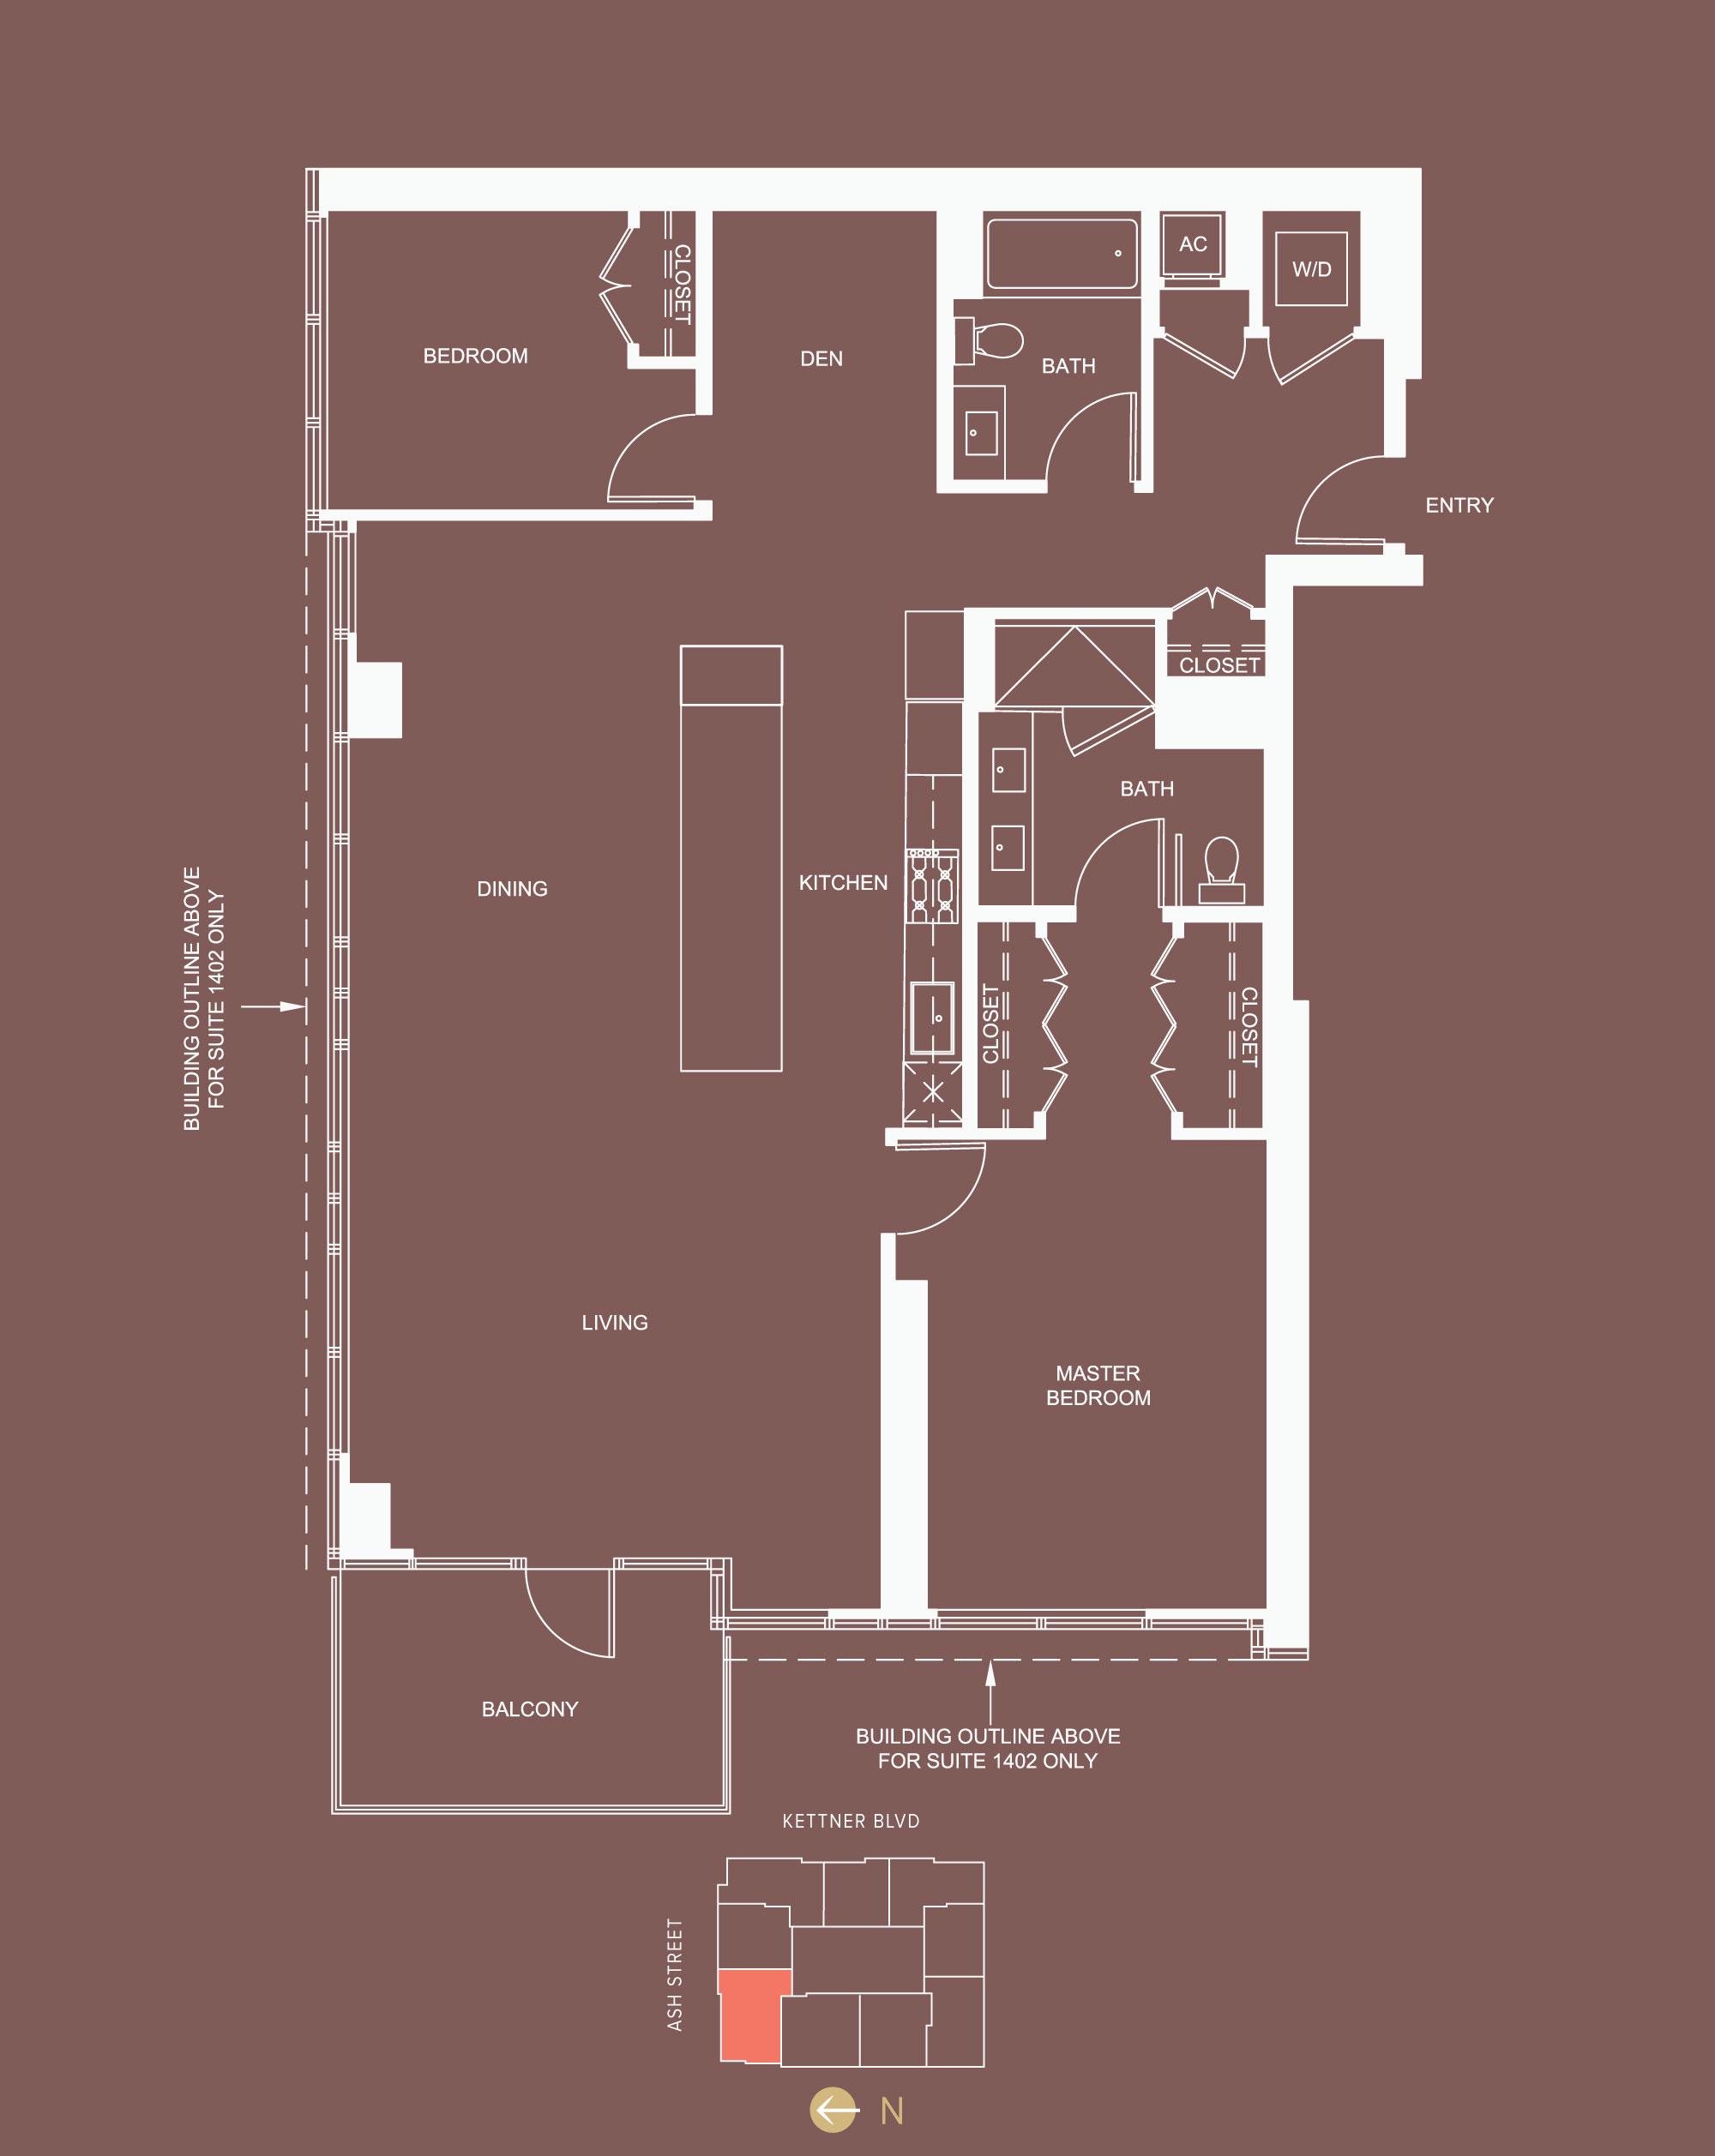 2 bed + den, 2 bath - approx. 1,632 sf - floor 6, 9-10, 13-14